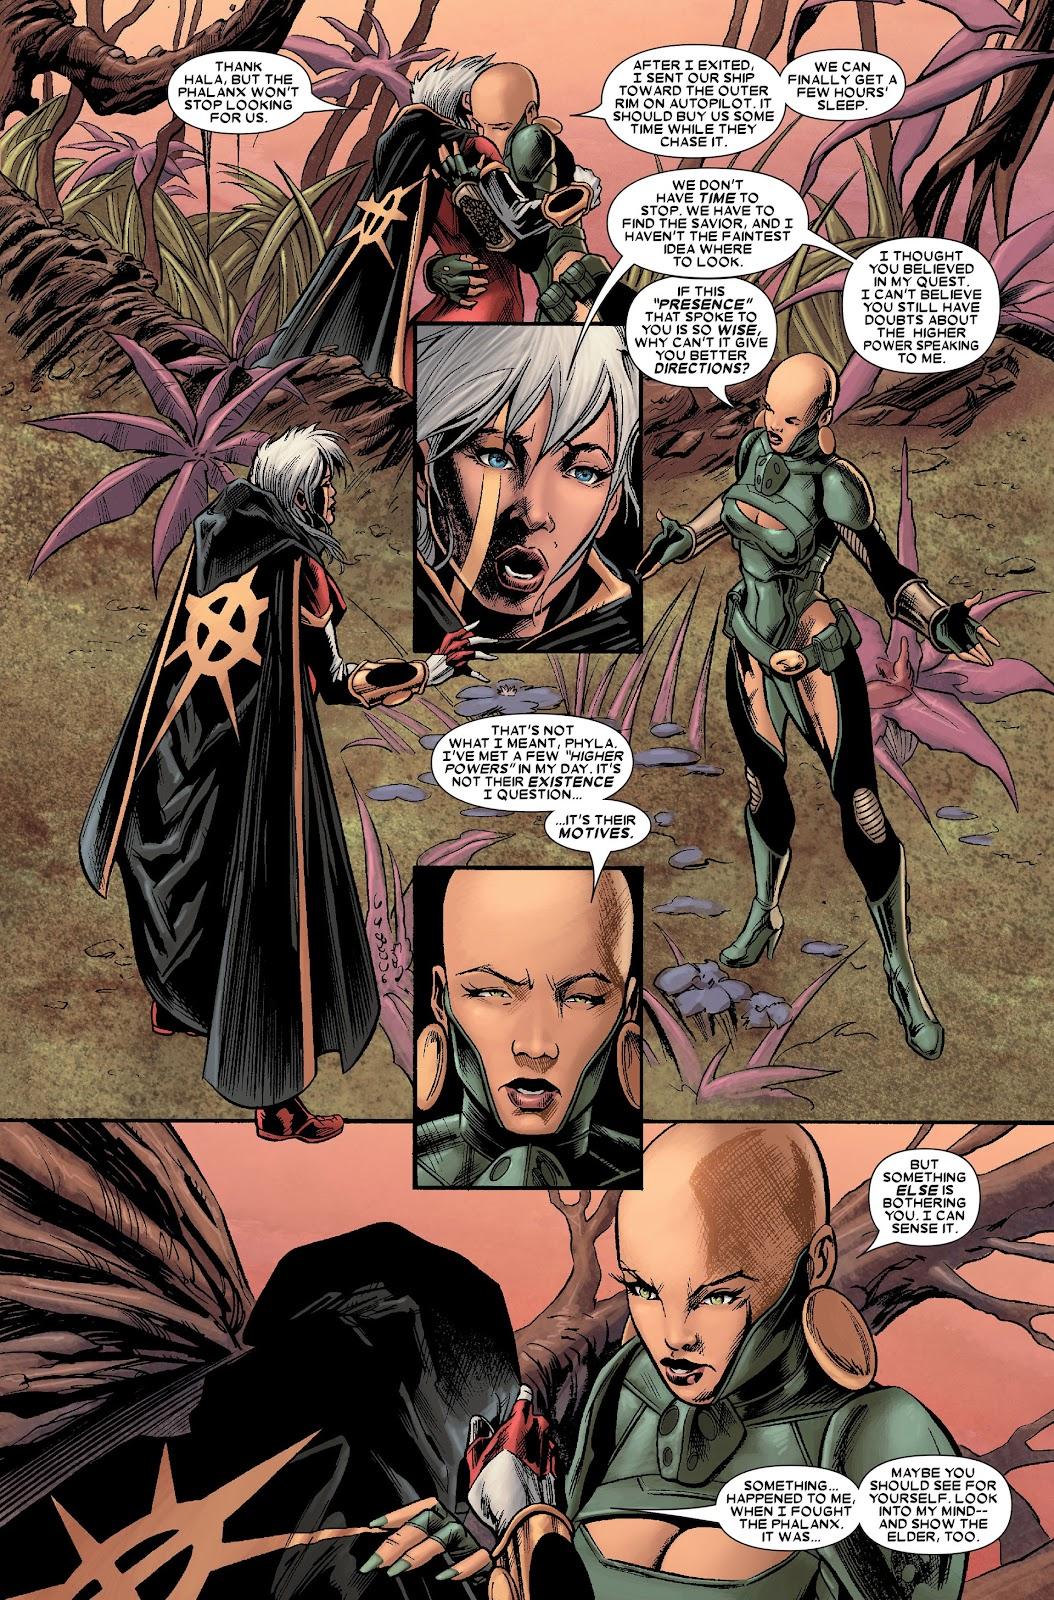 Annihilation: Conquest - Quasar issue 1 - Page 14